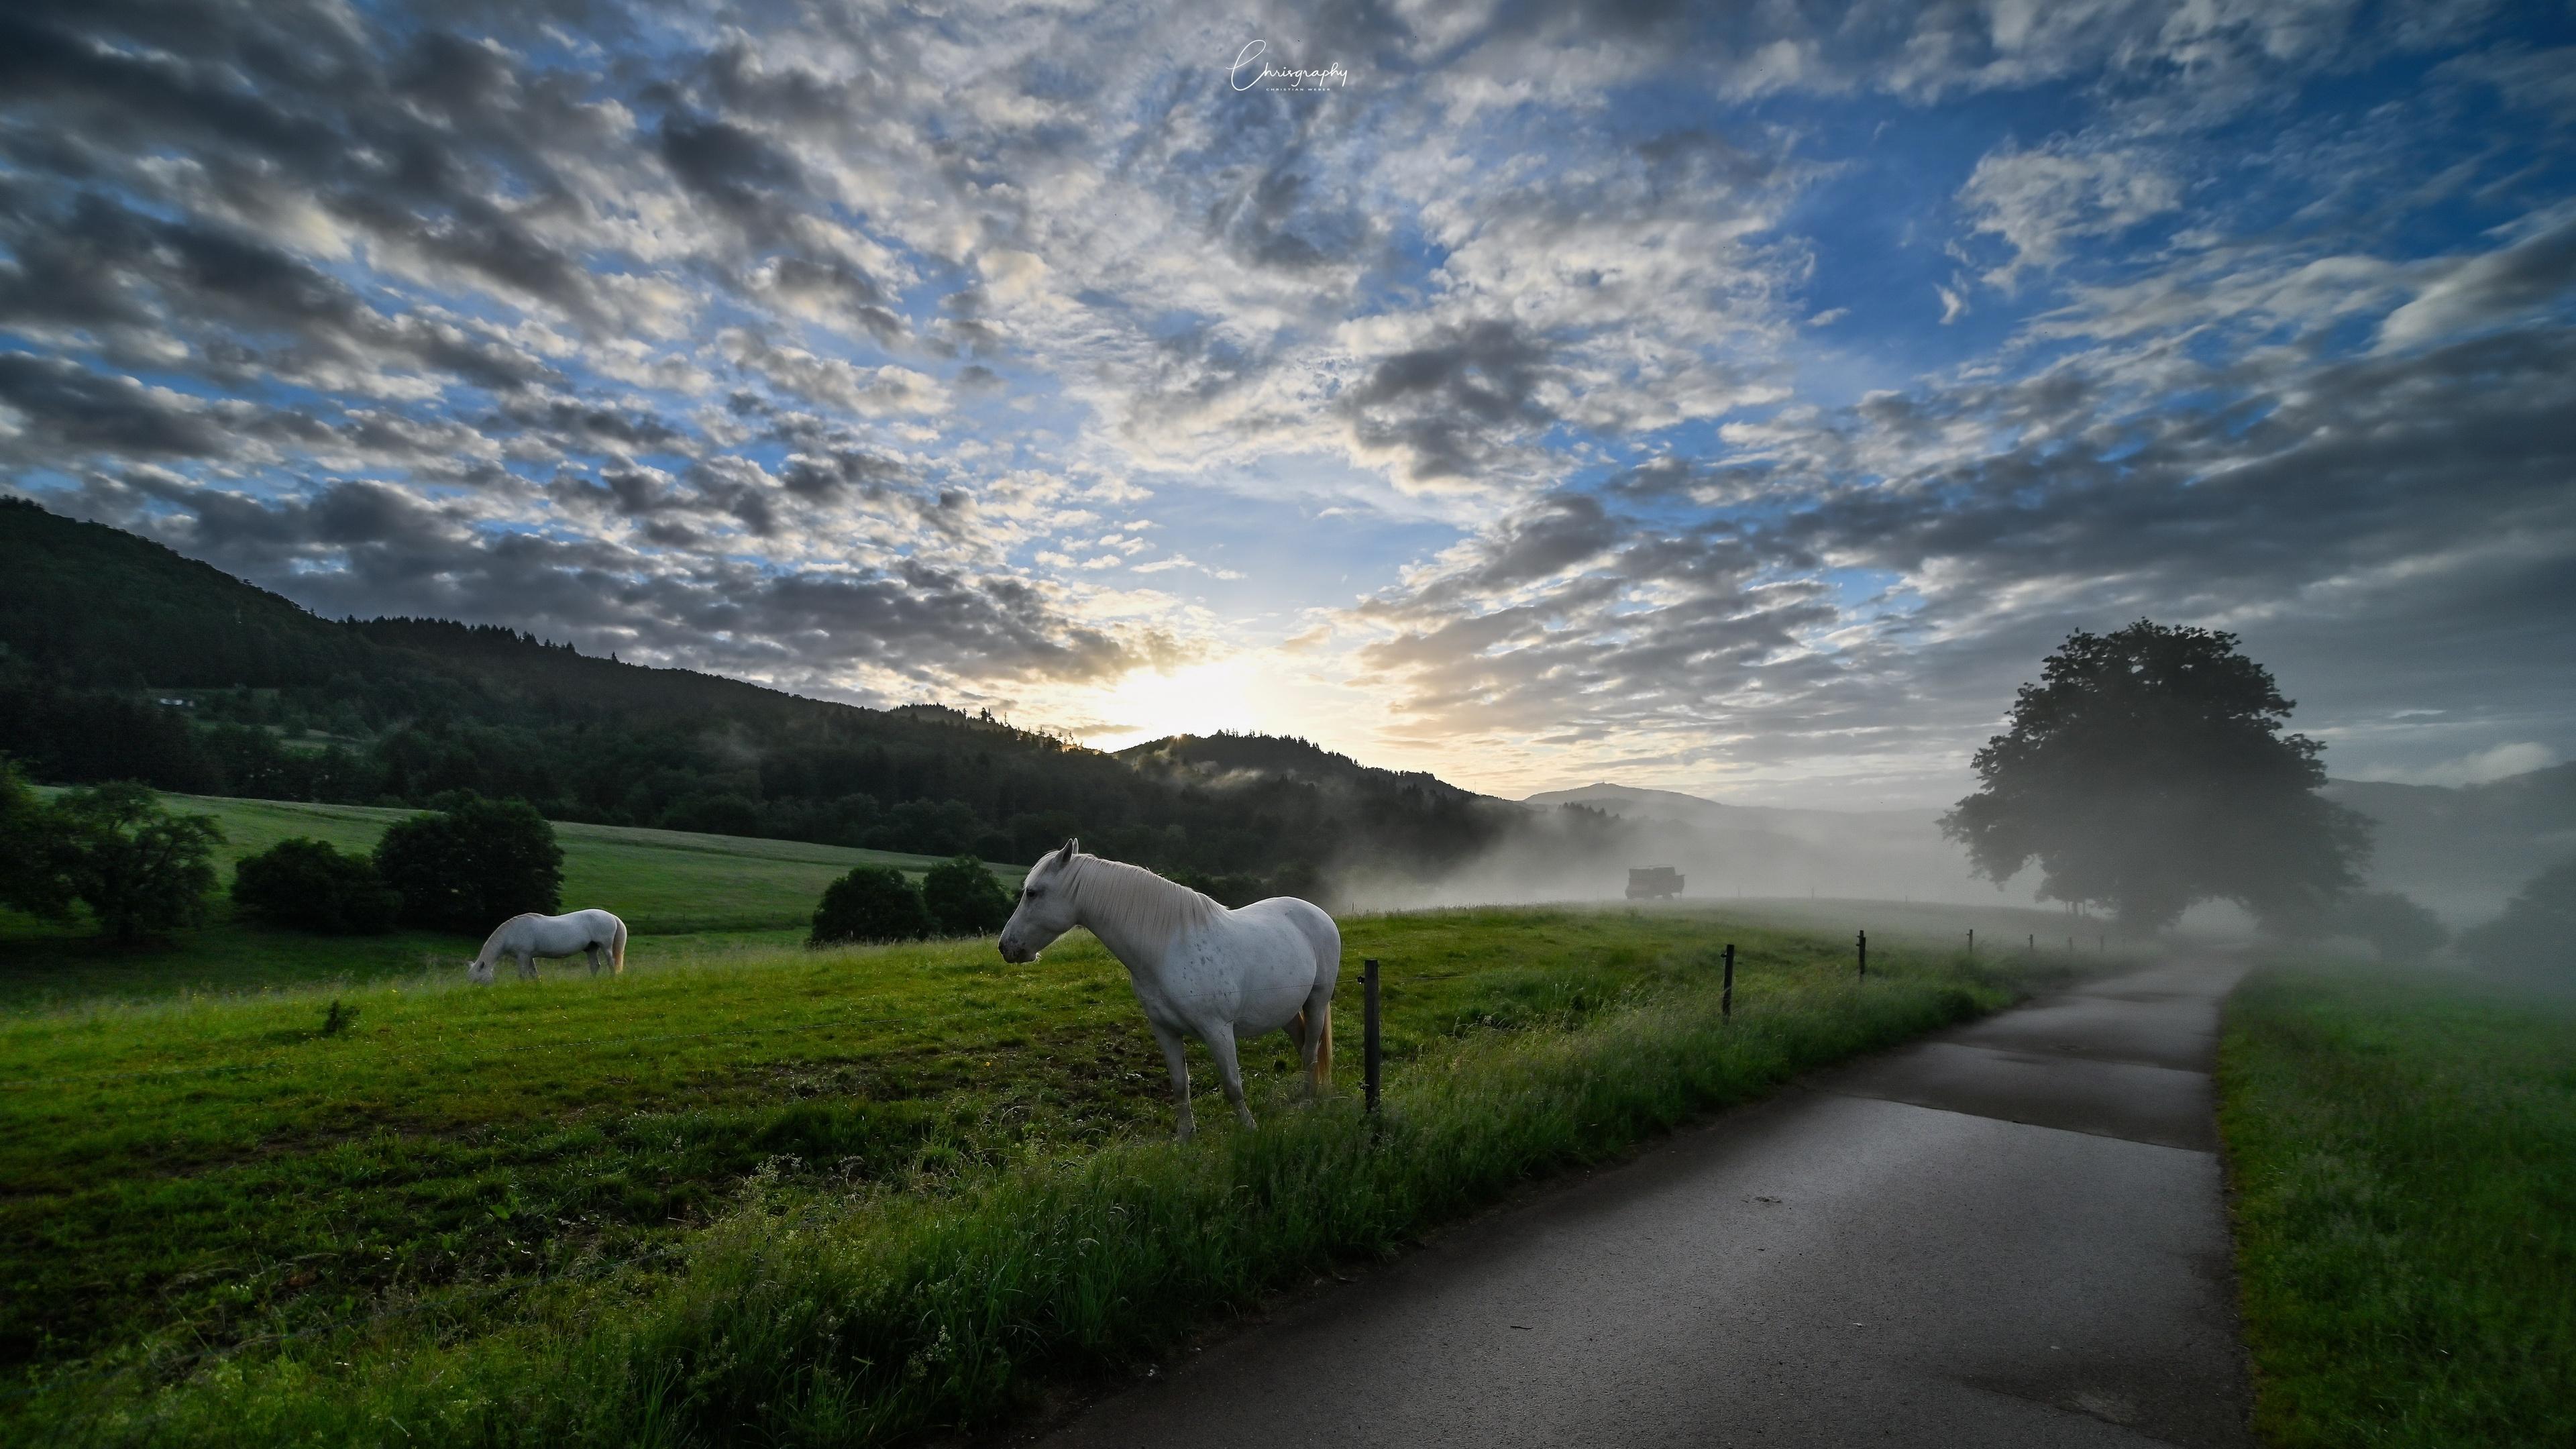 General 3840x2160 sky outdoors road animals clouds sunlight horse mammals